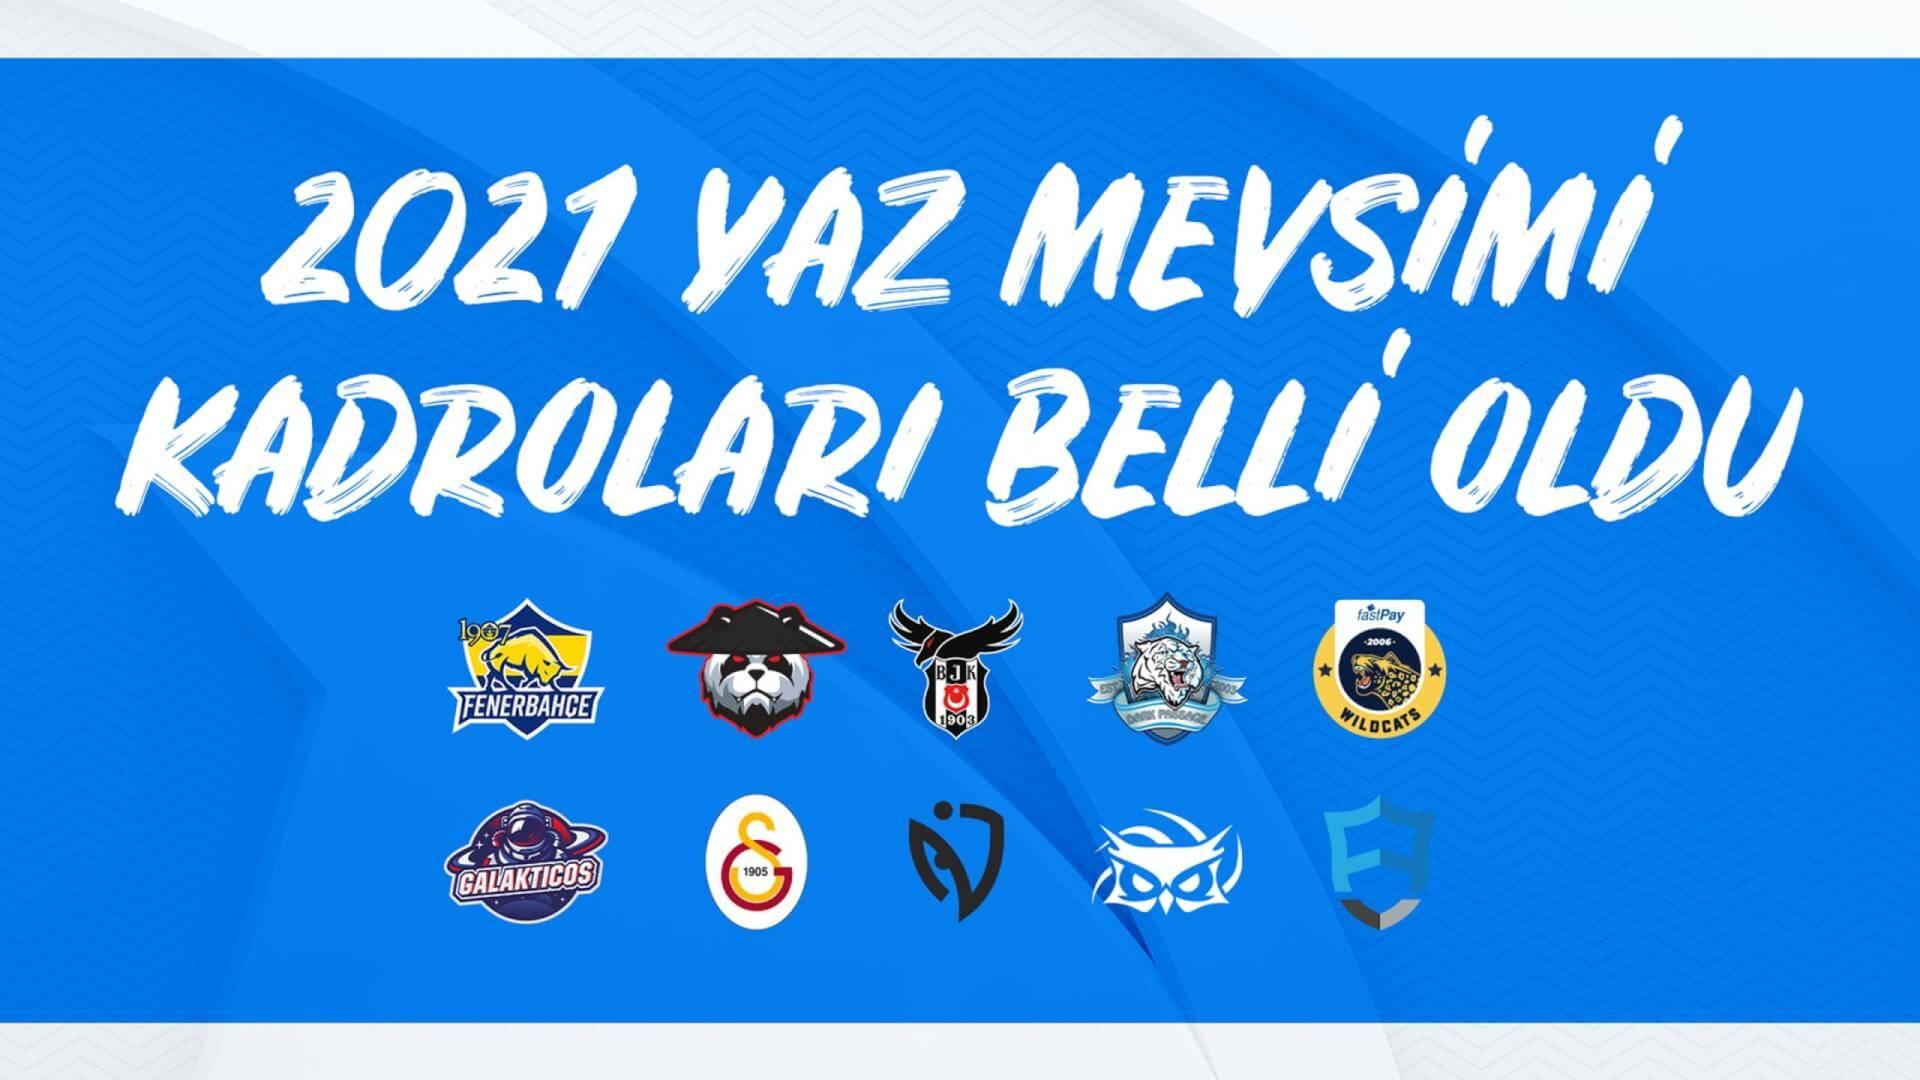 TCL 2021 MAKALE YATAY copy 1600x900 scaled